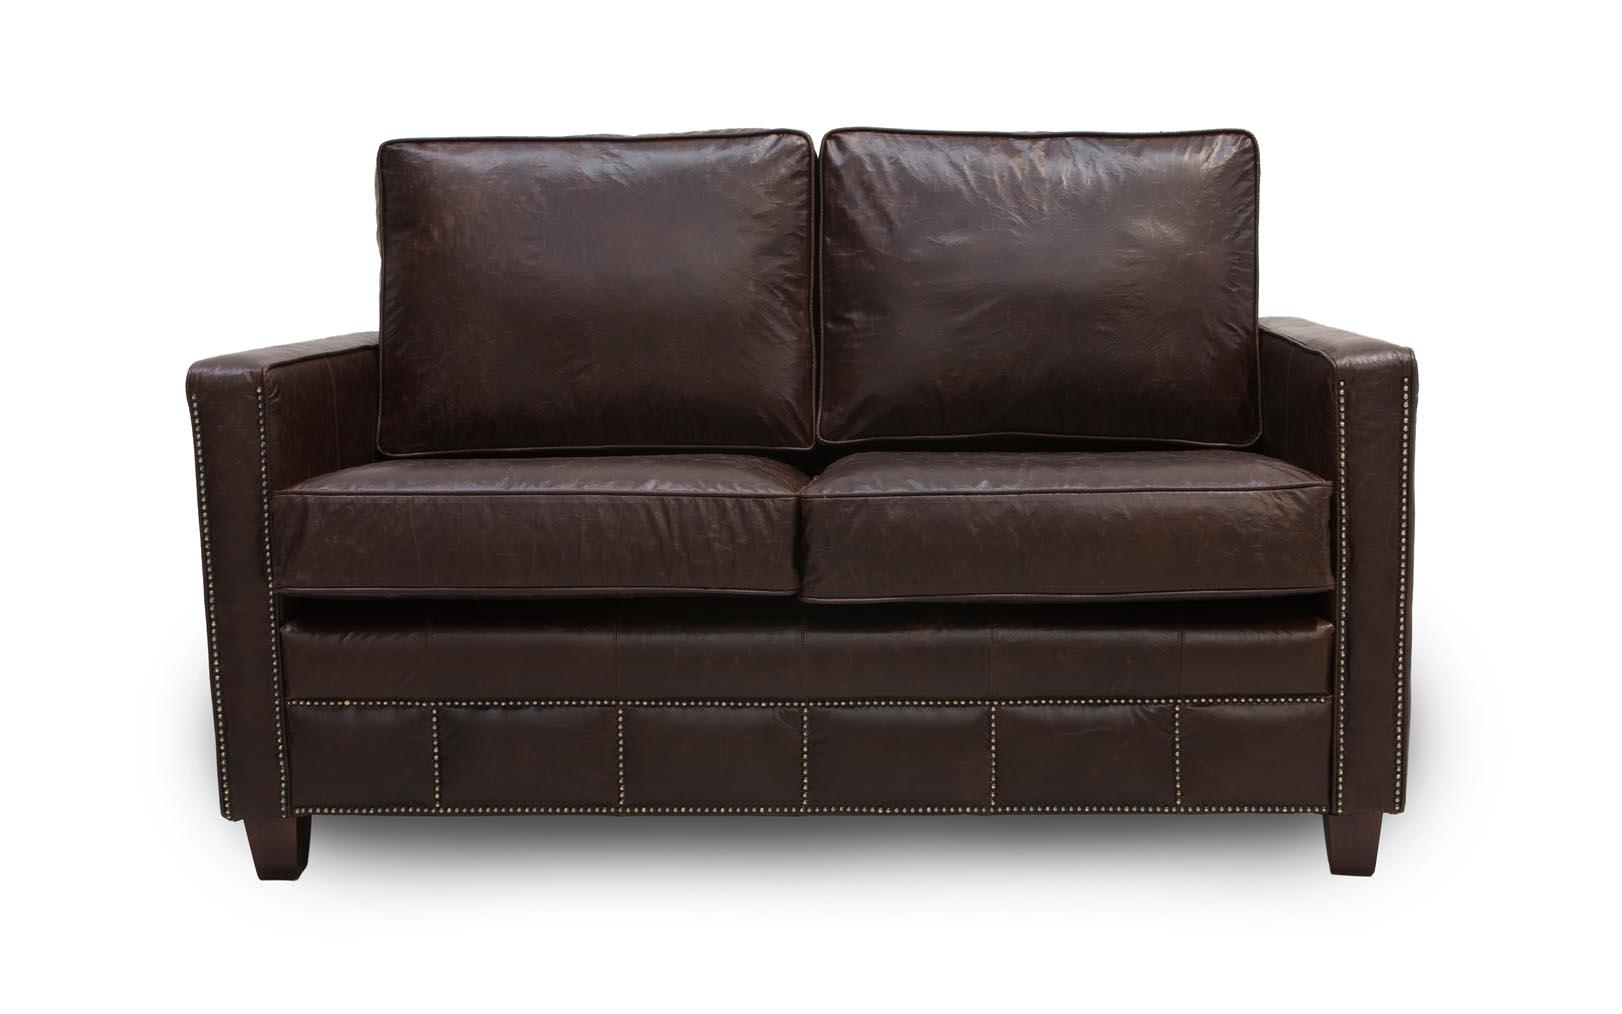 Sligo Vintage Leather Sofas Traditional Settee Design